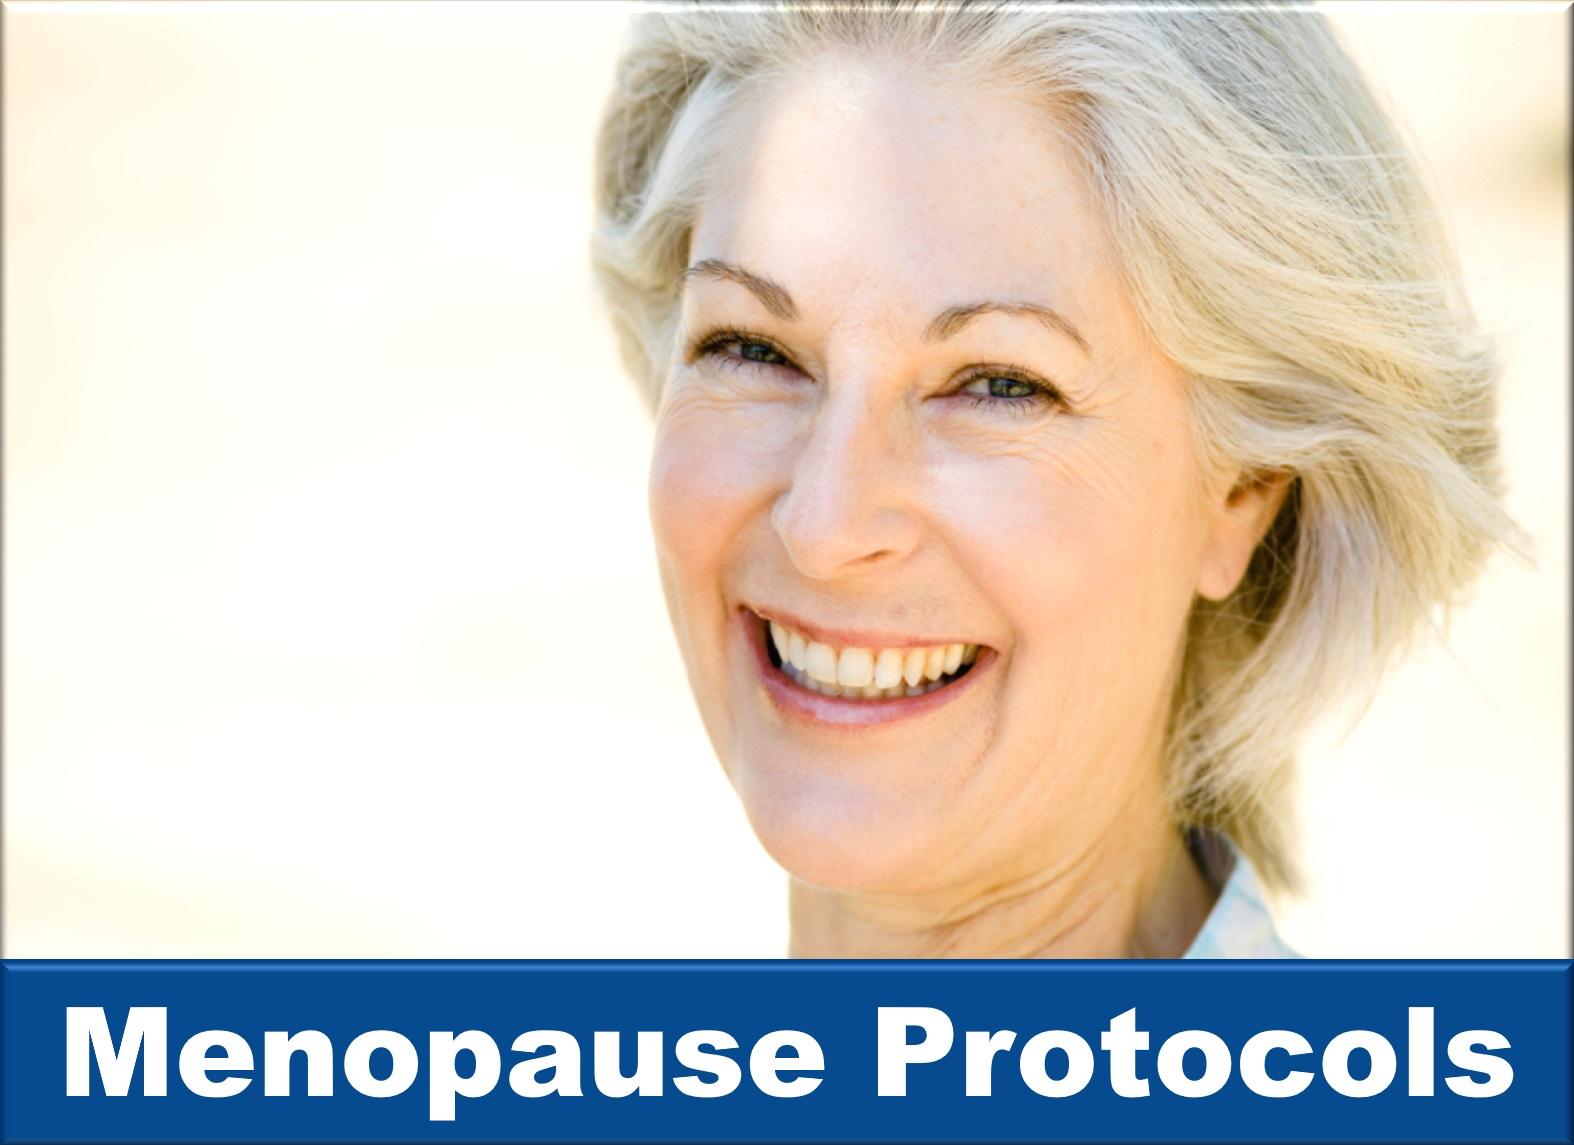 Menopause Protocols